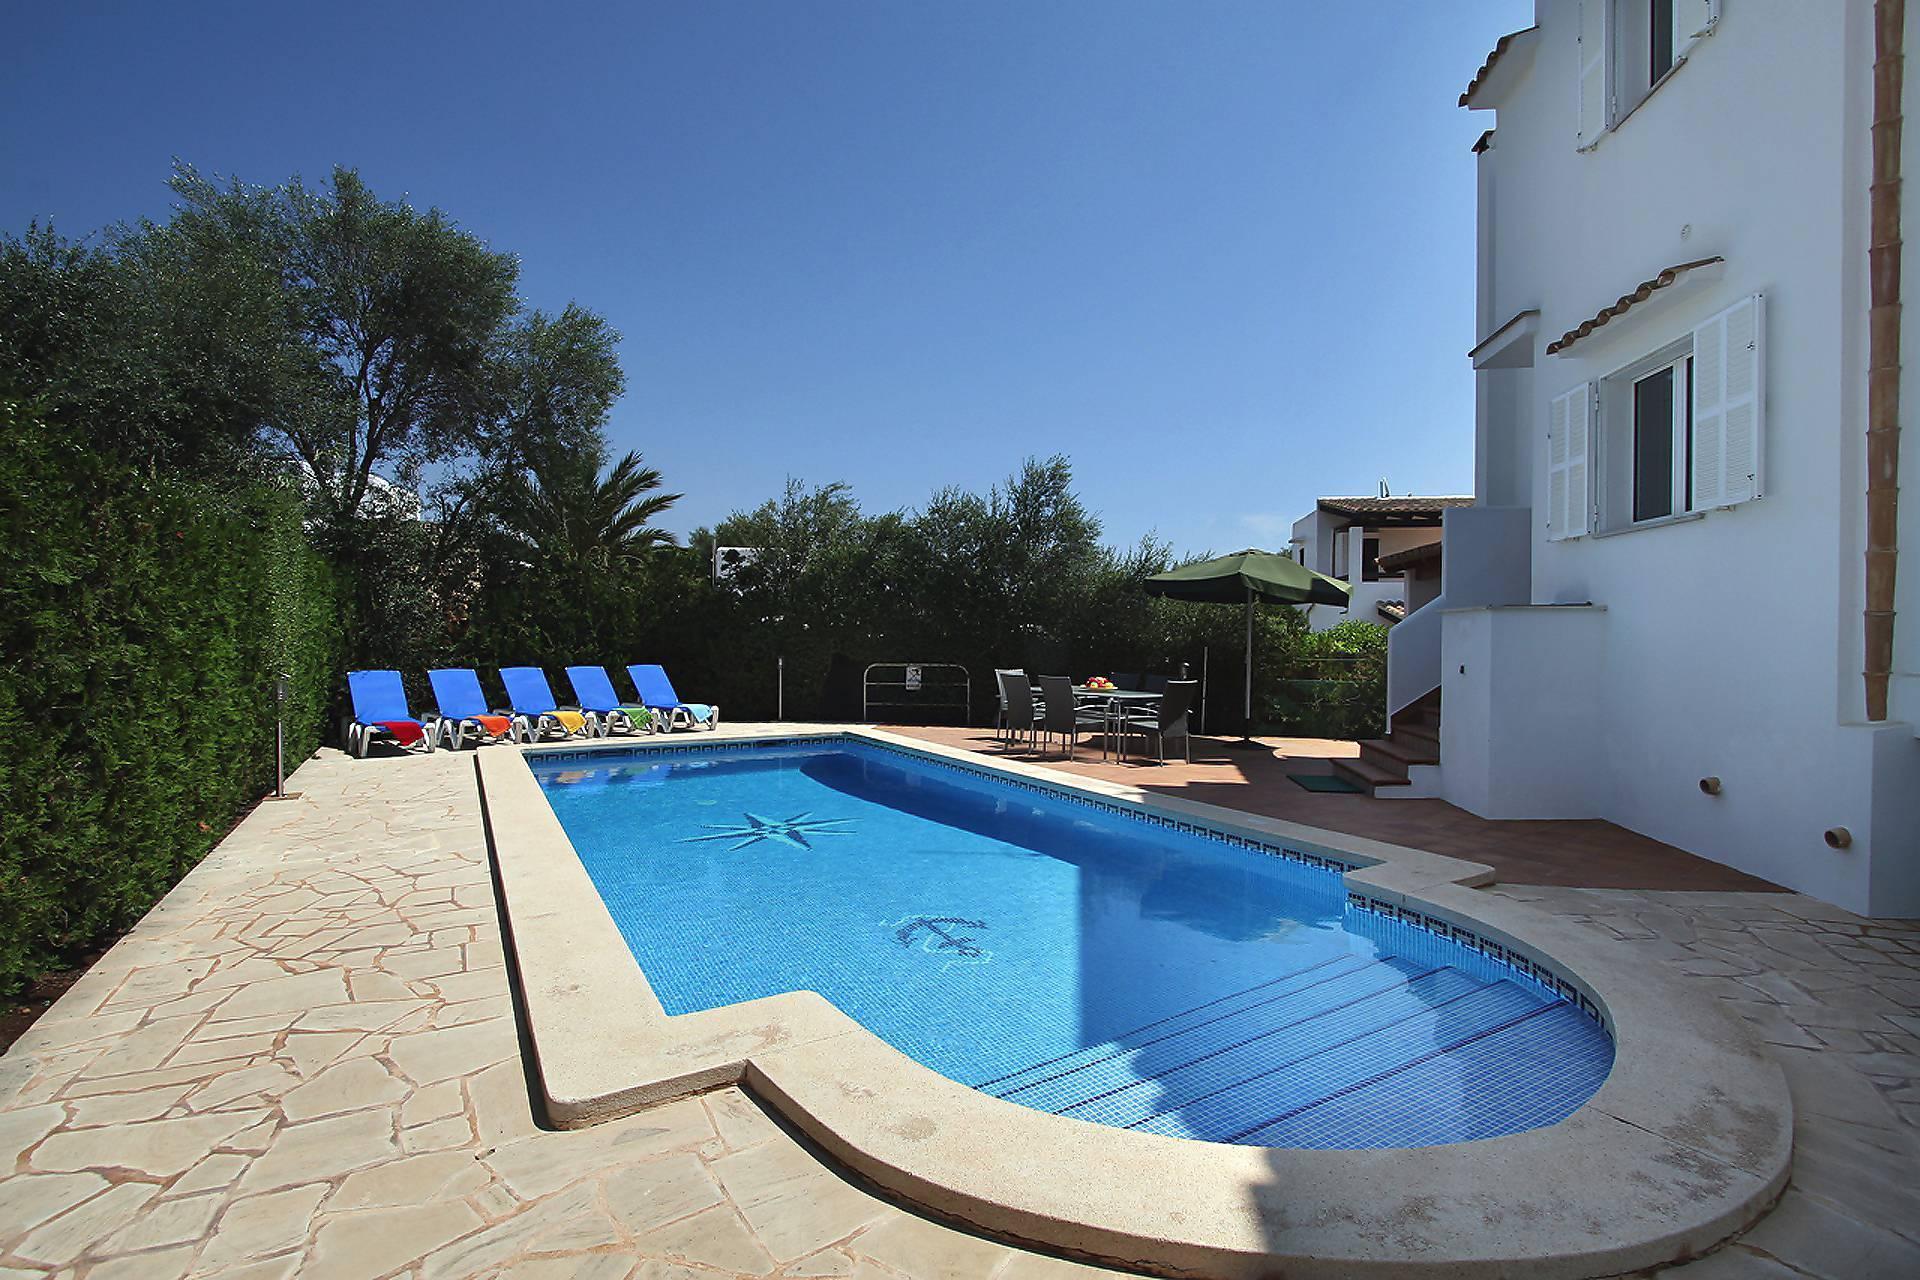 01-128 Rustic holiday home Majorca East Bild 6